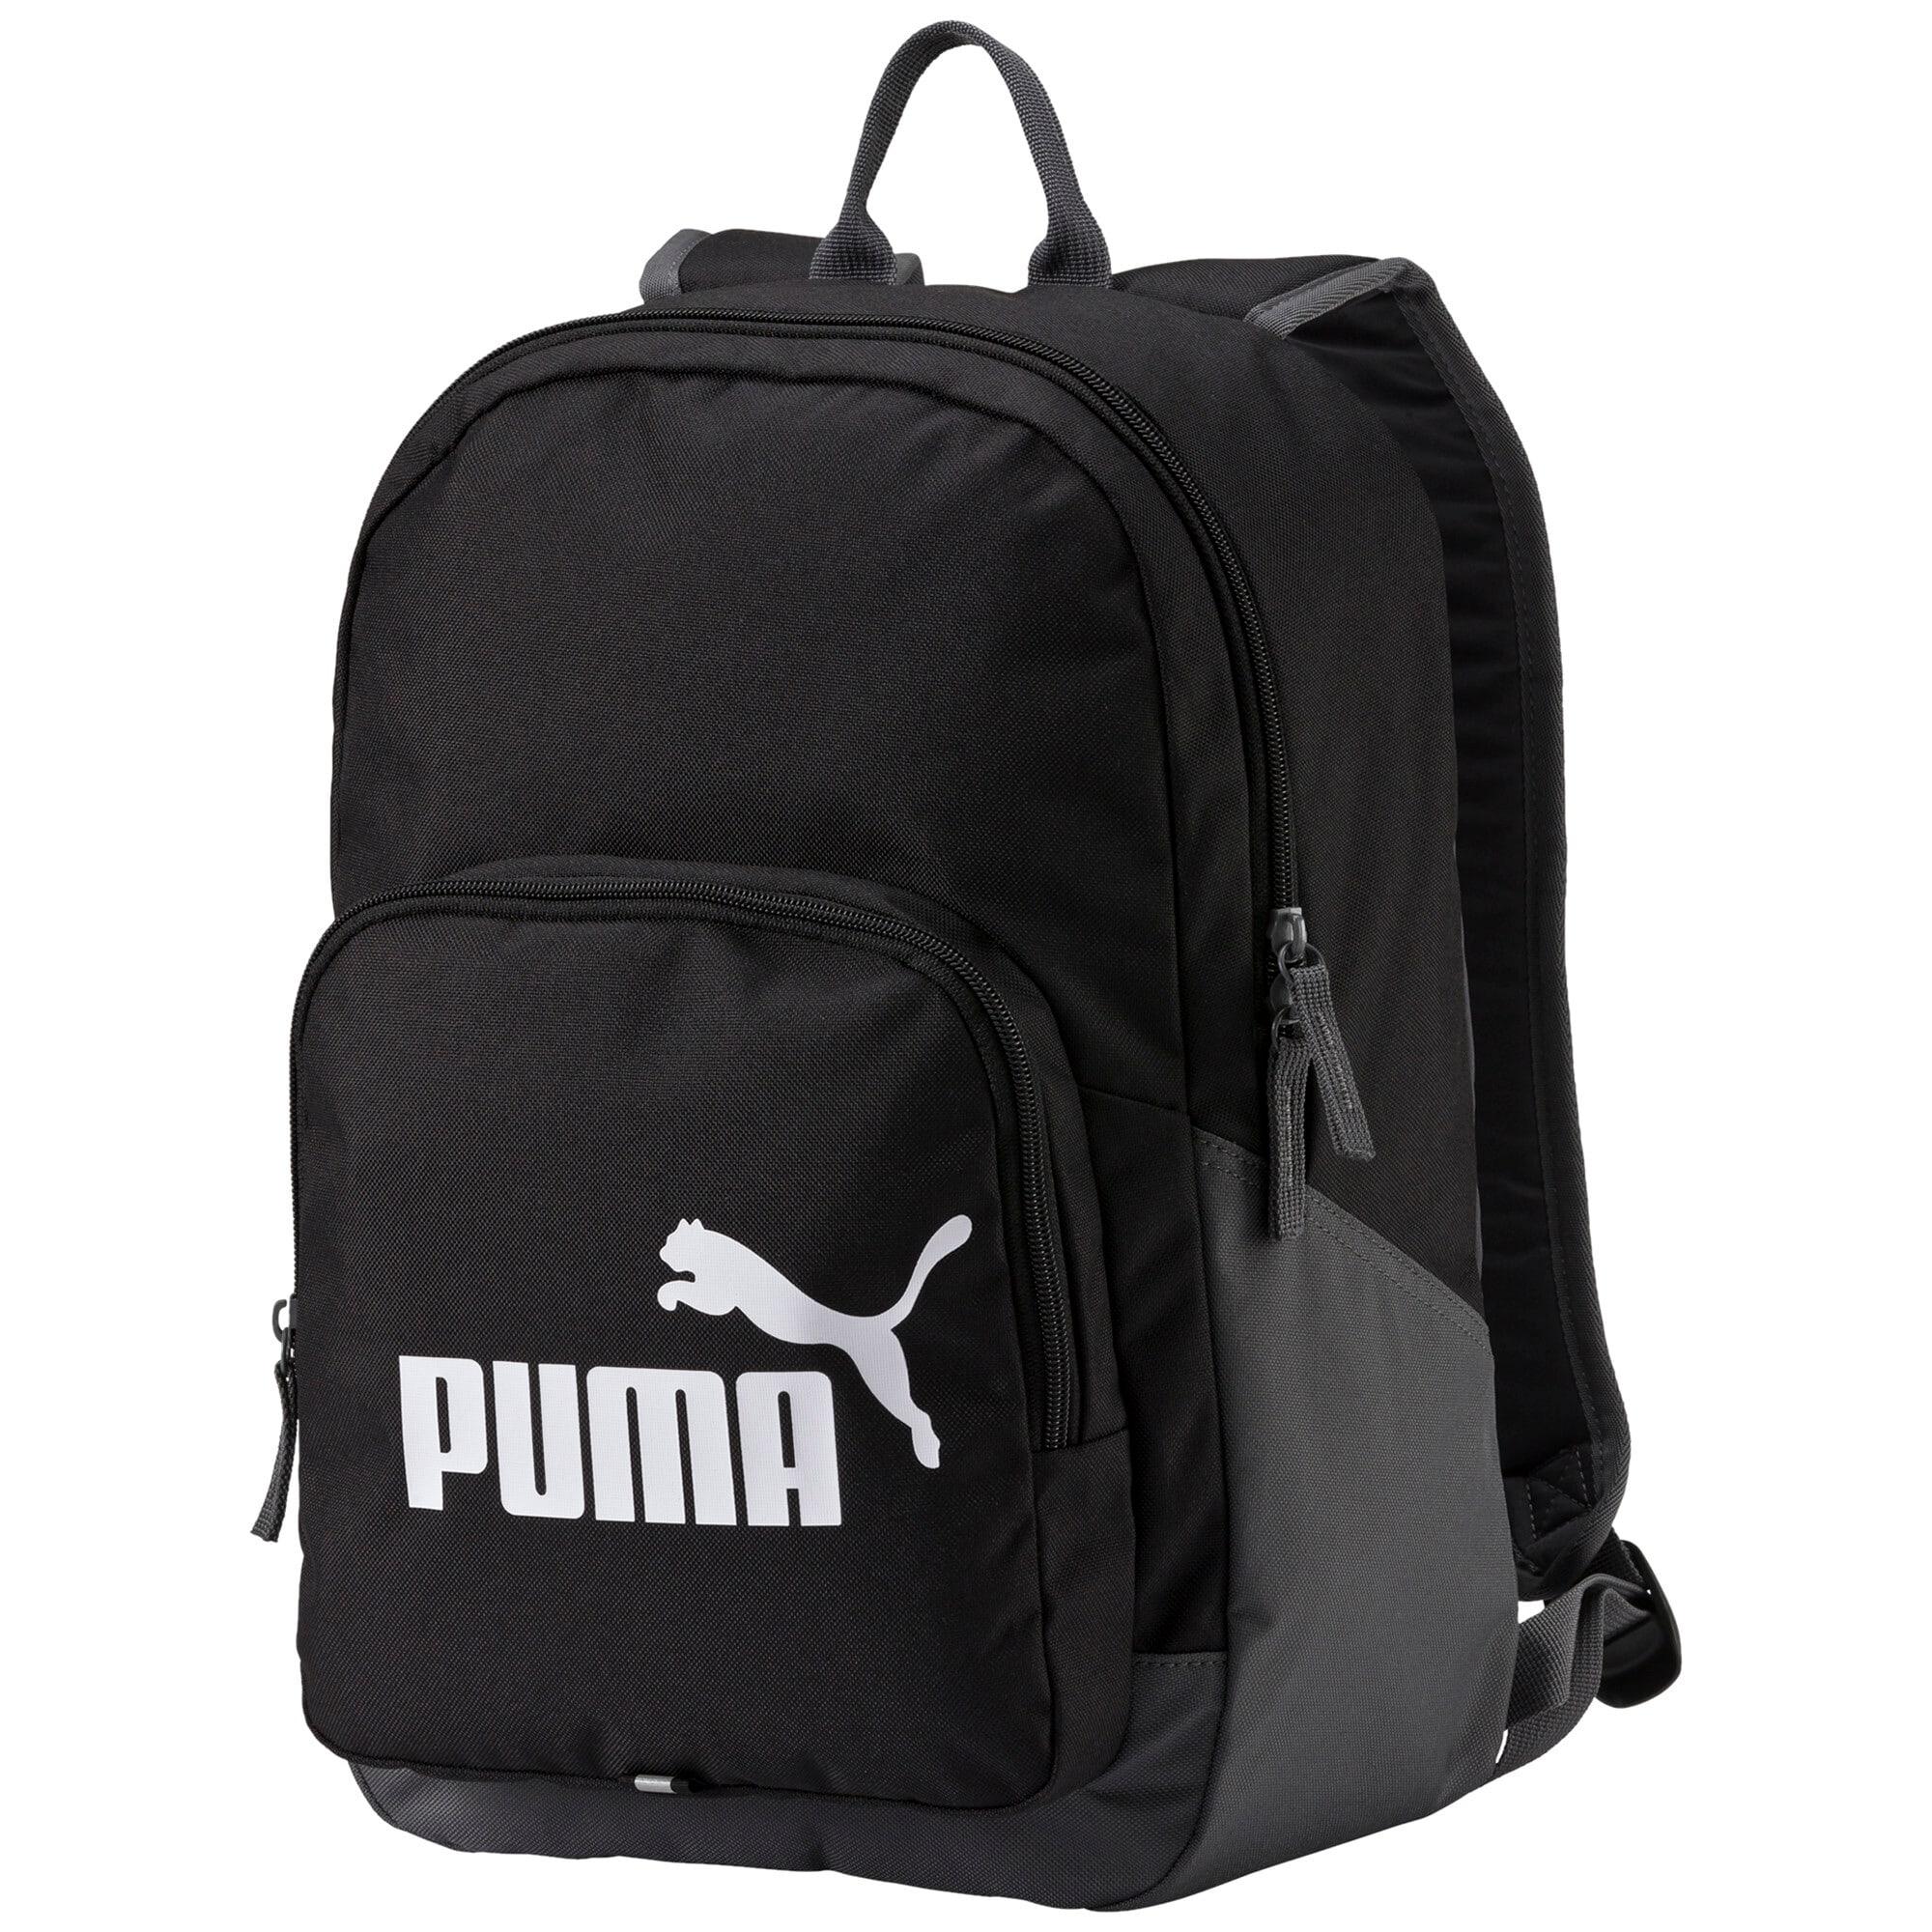 Thumbnail 1 of PUMA Phase Backpack, black, medium-IND